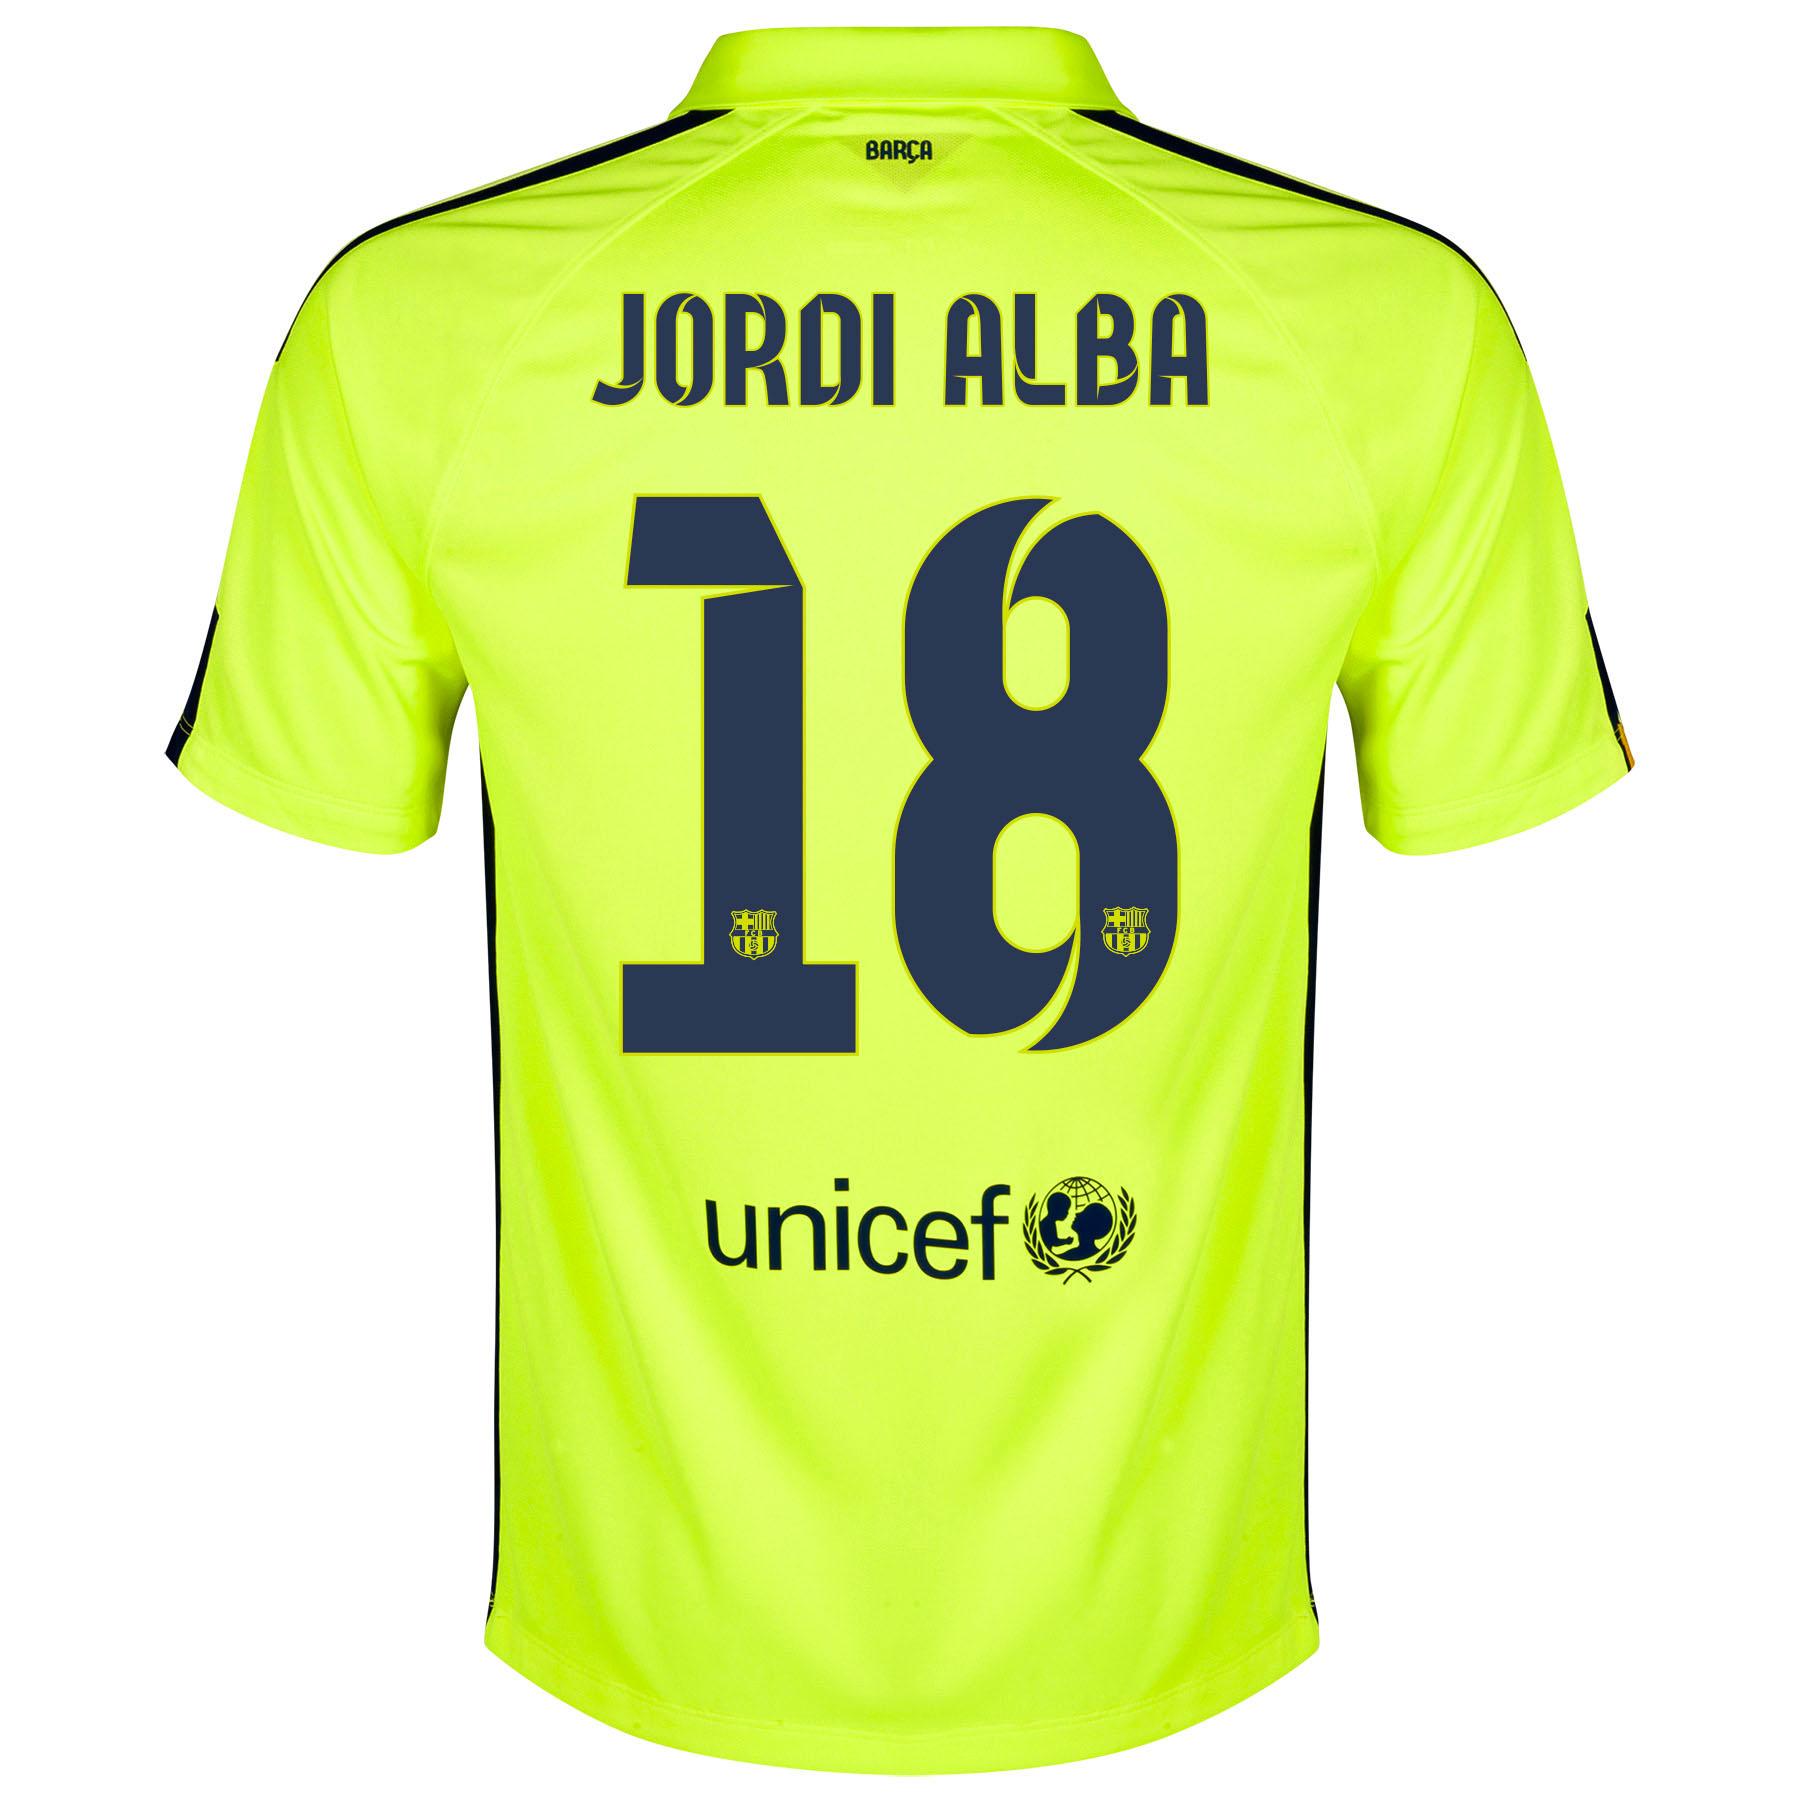 Barcelona Third Shirt 2014/15 Yellow with Jordi Alba 18 printing